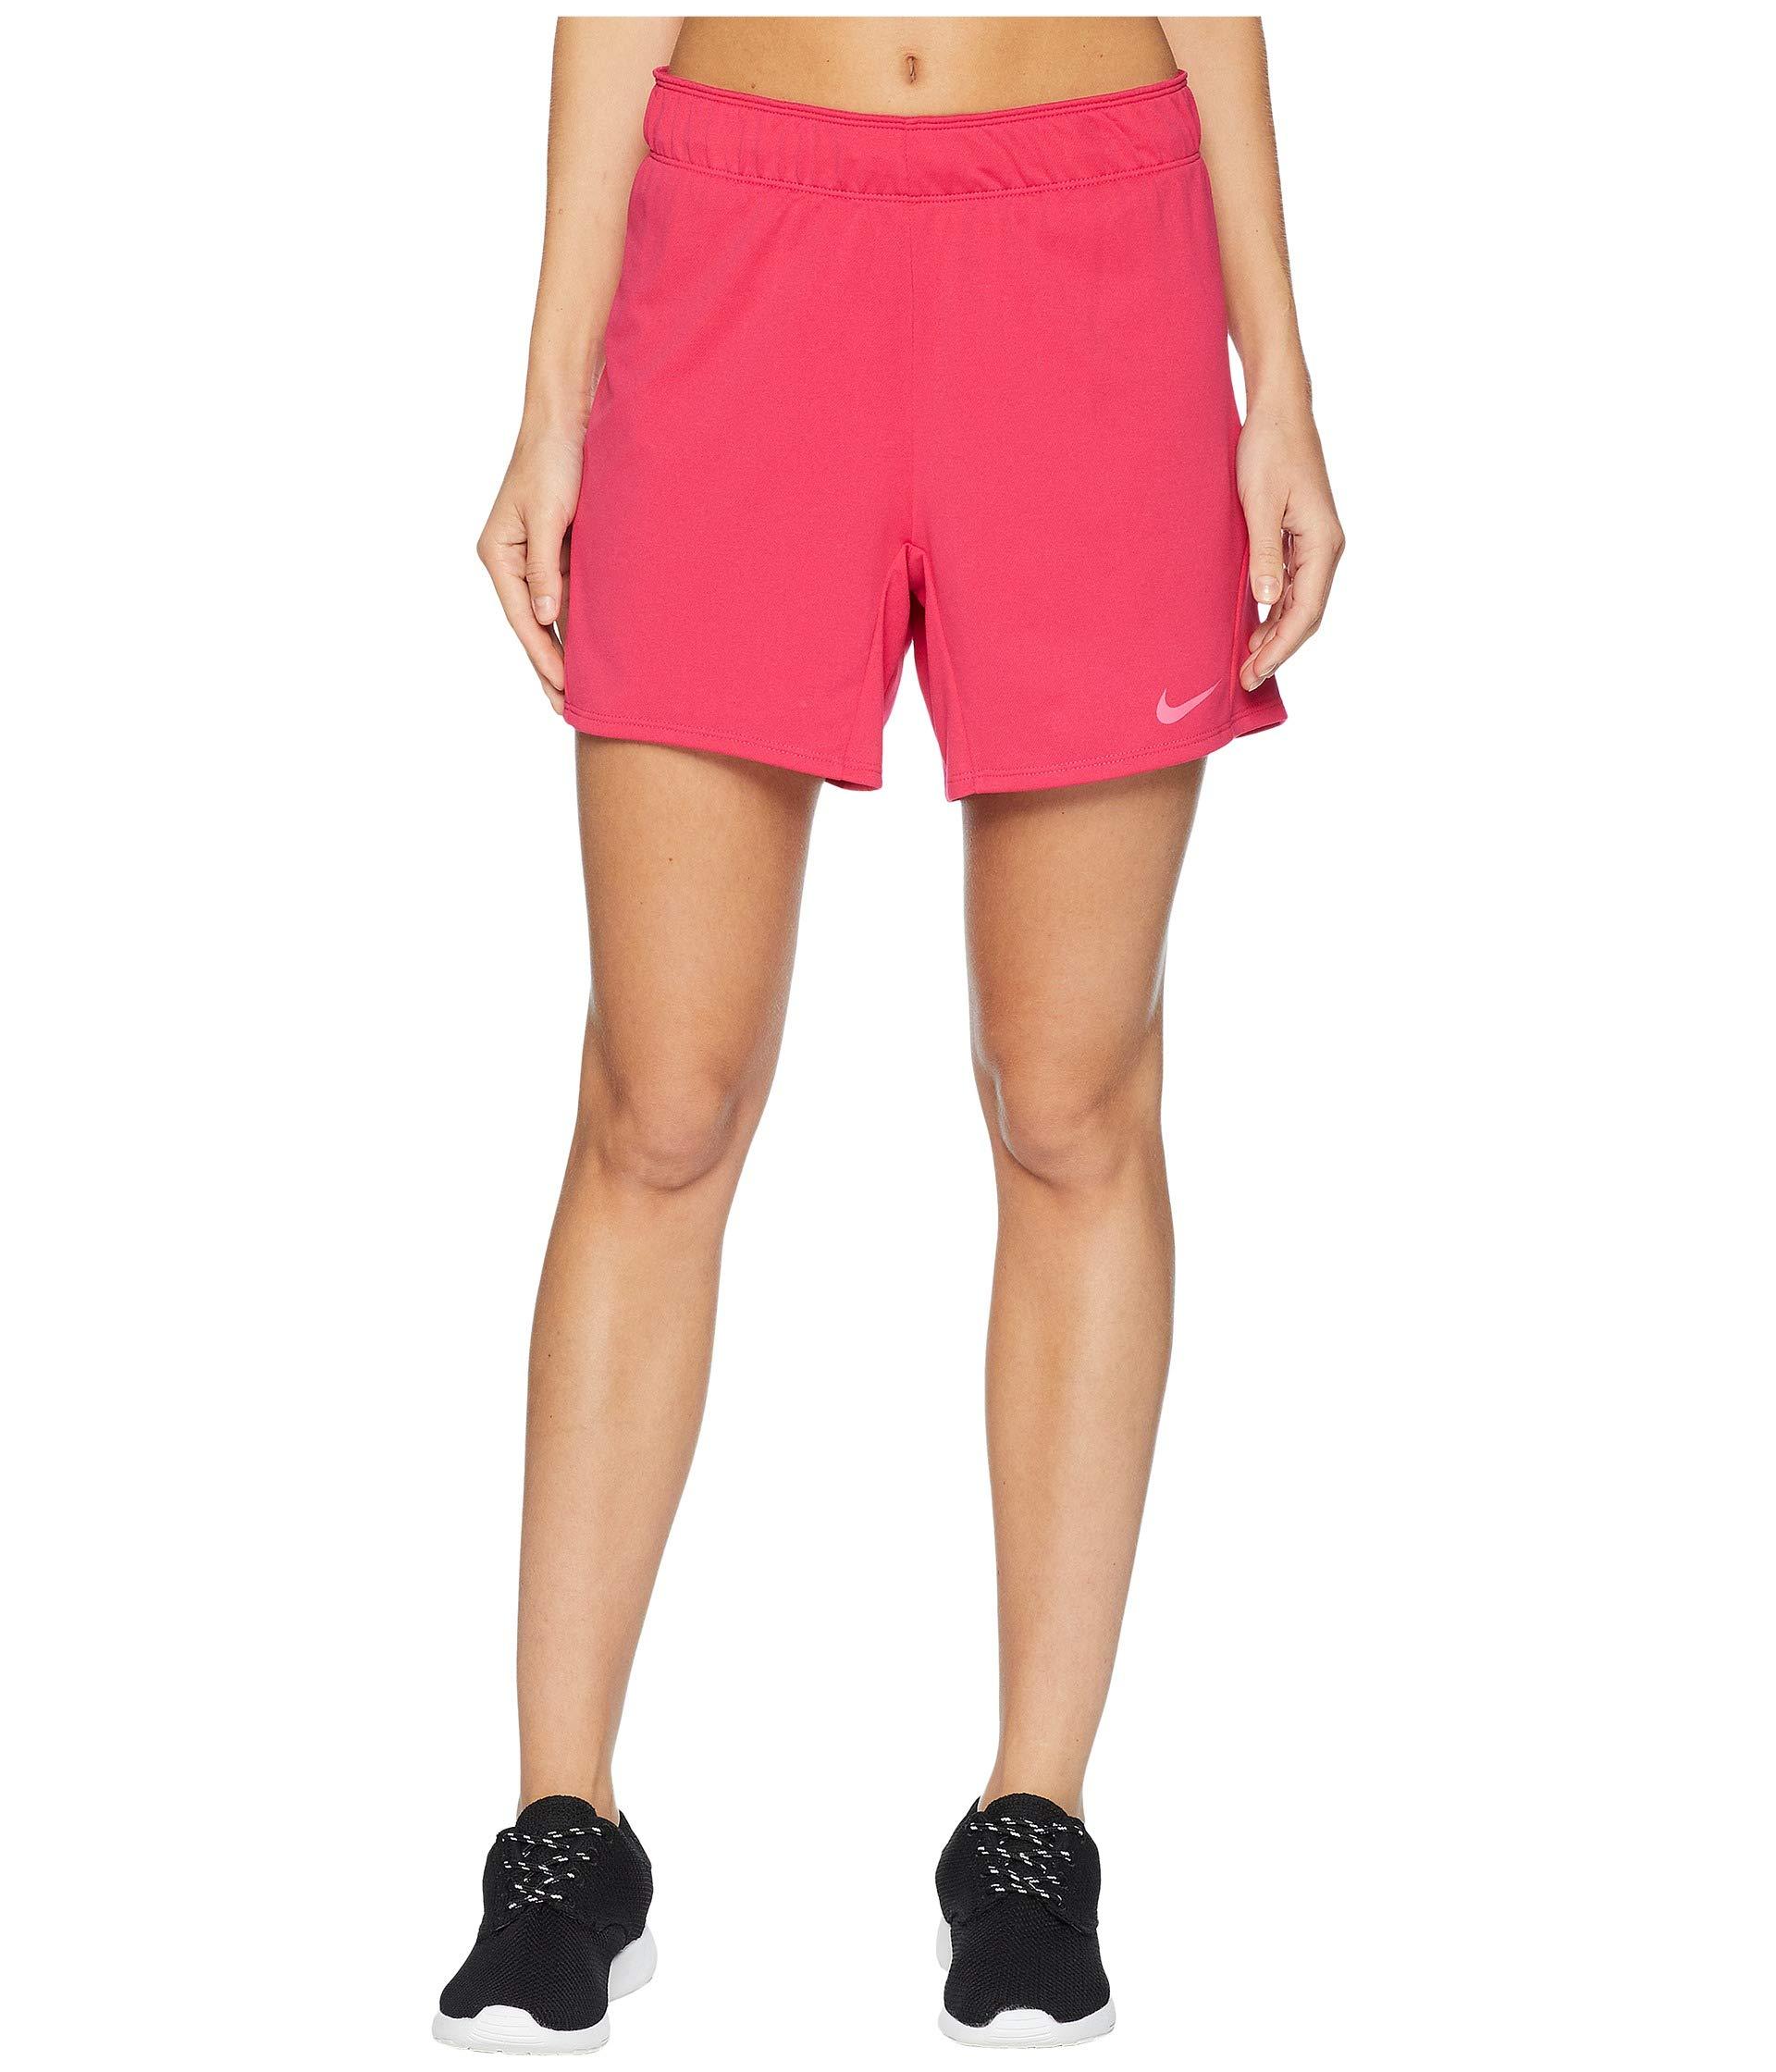 Nike Women's Flex Attack Training Short Rush Pink/Watermelon X-Small 5.5